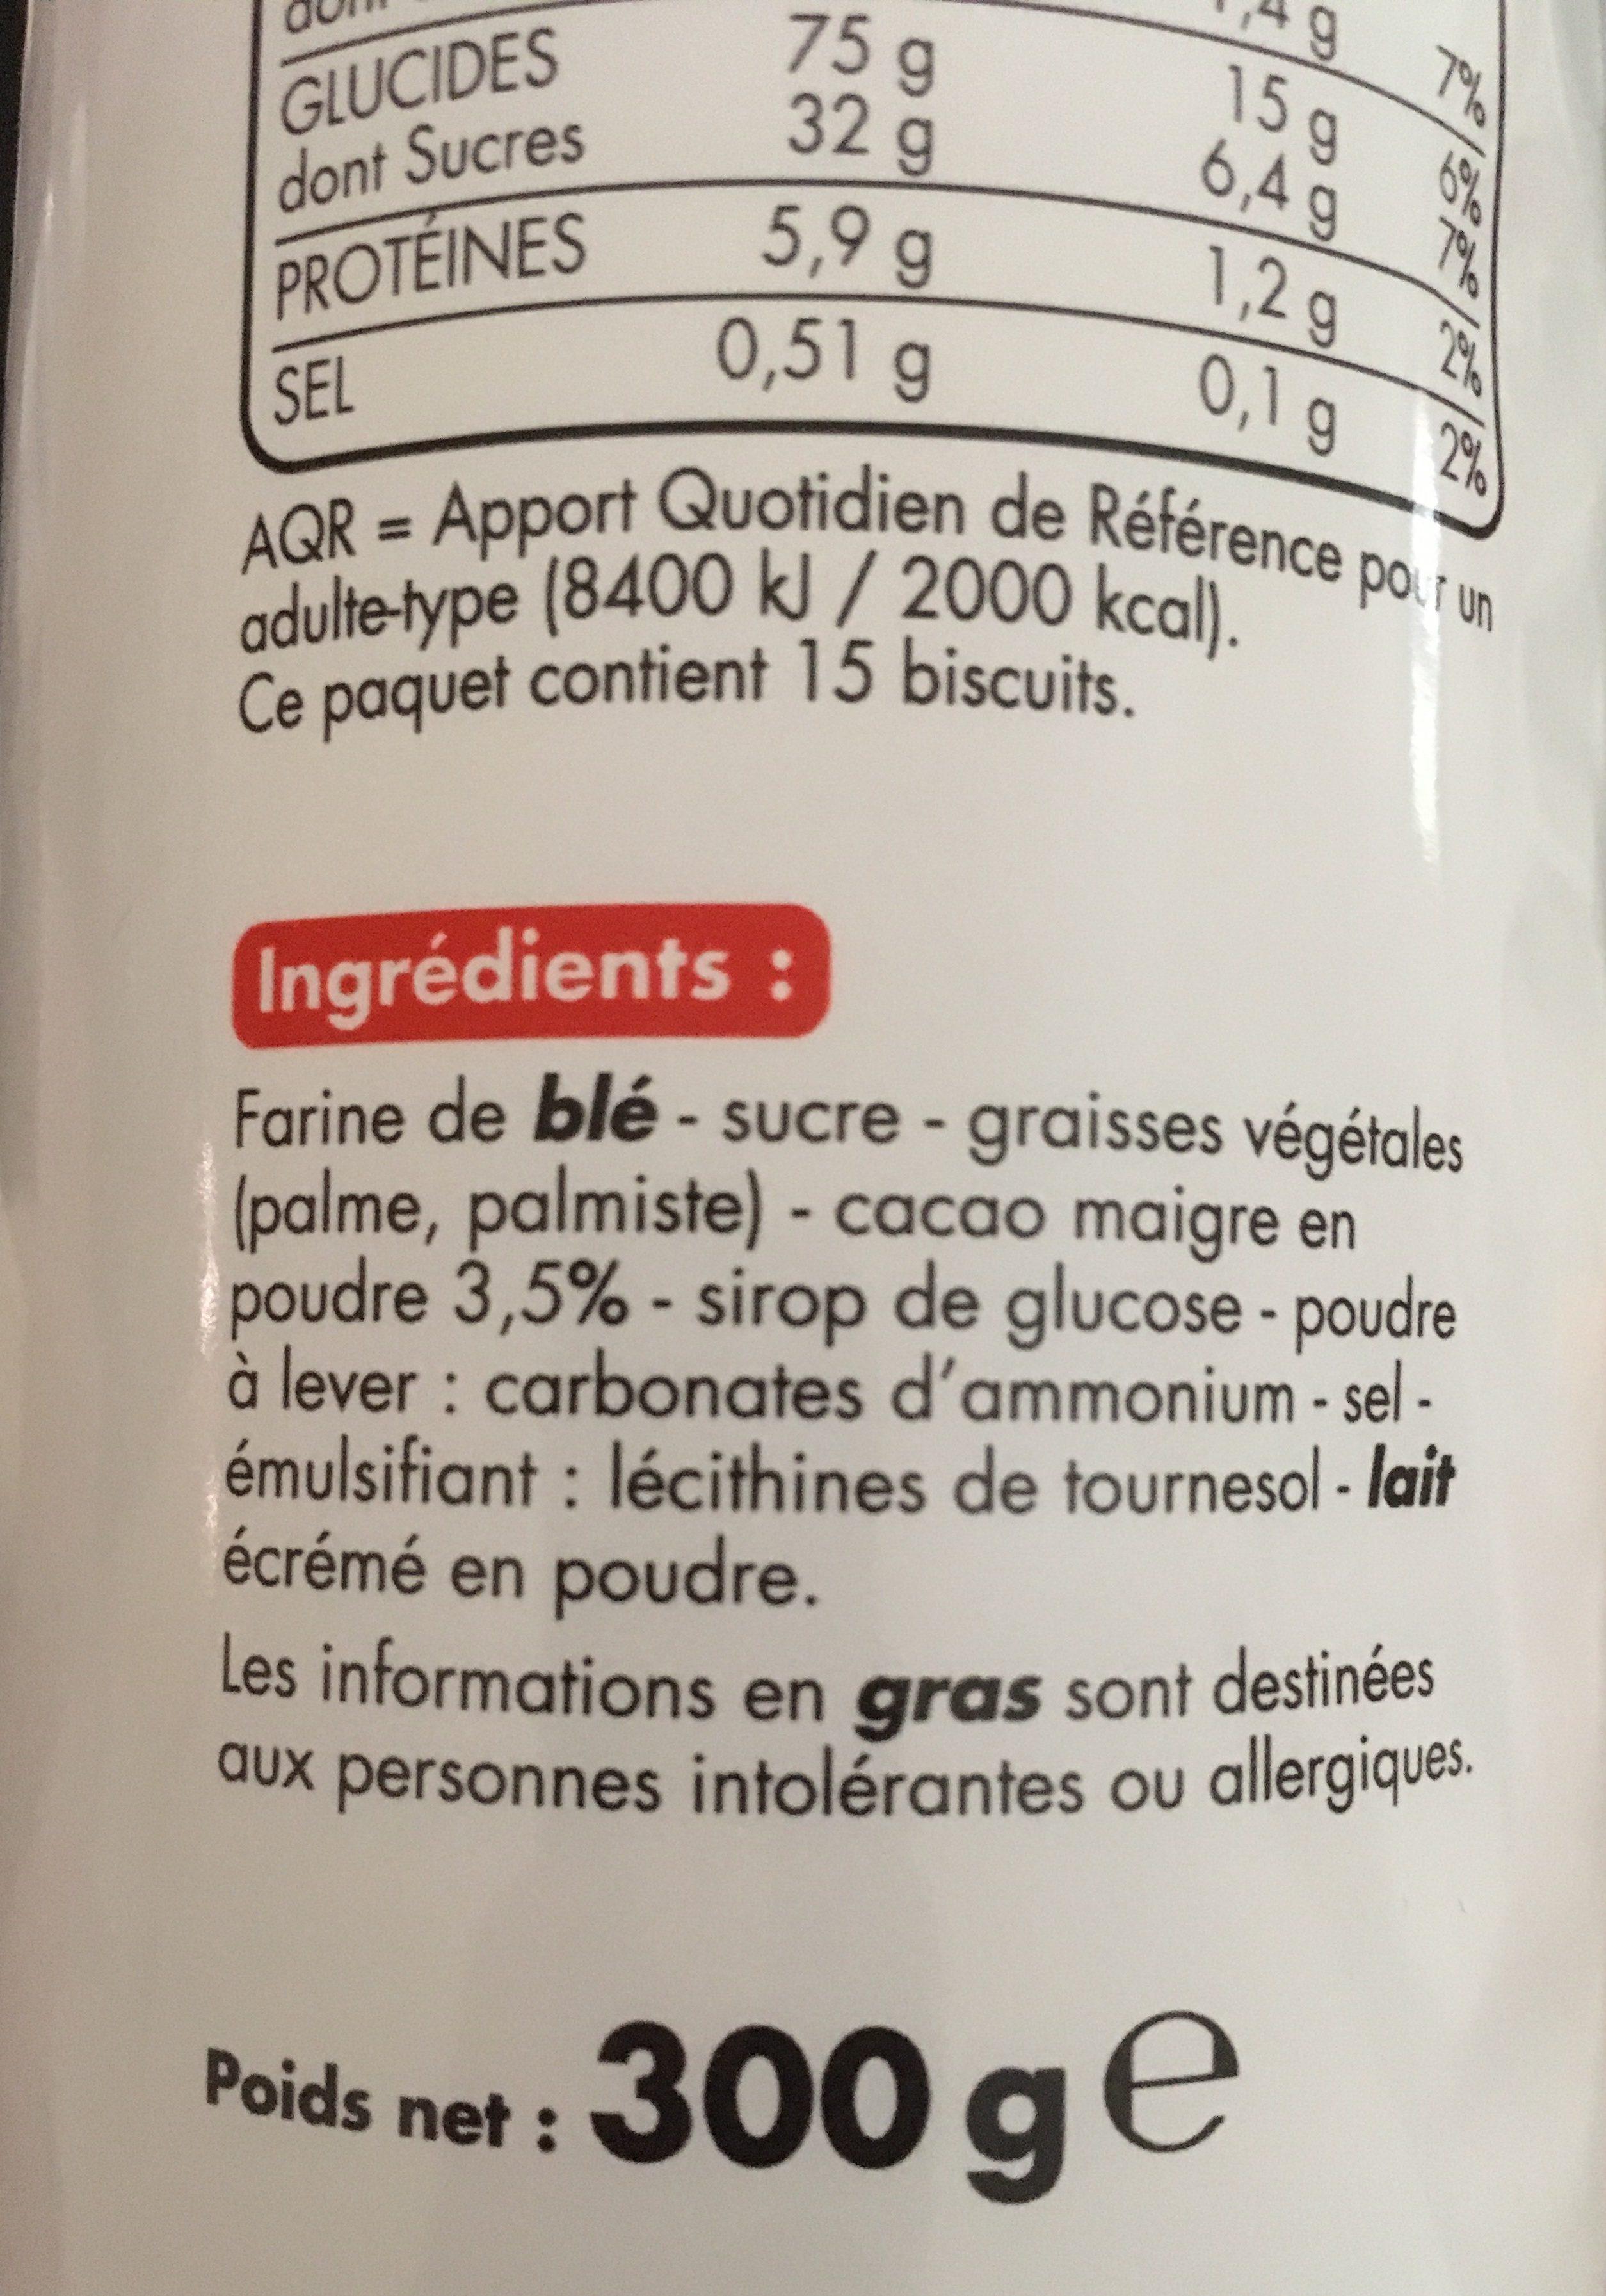 Goûters ronds parfum cacao - Ingredients